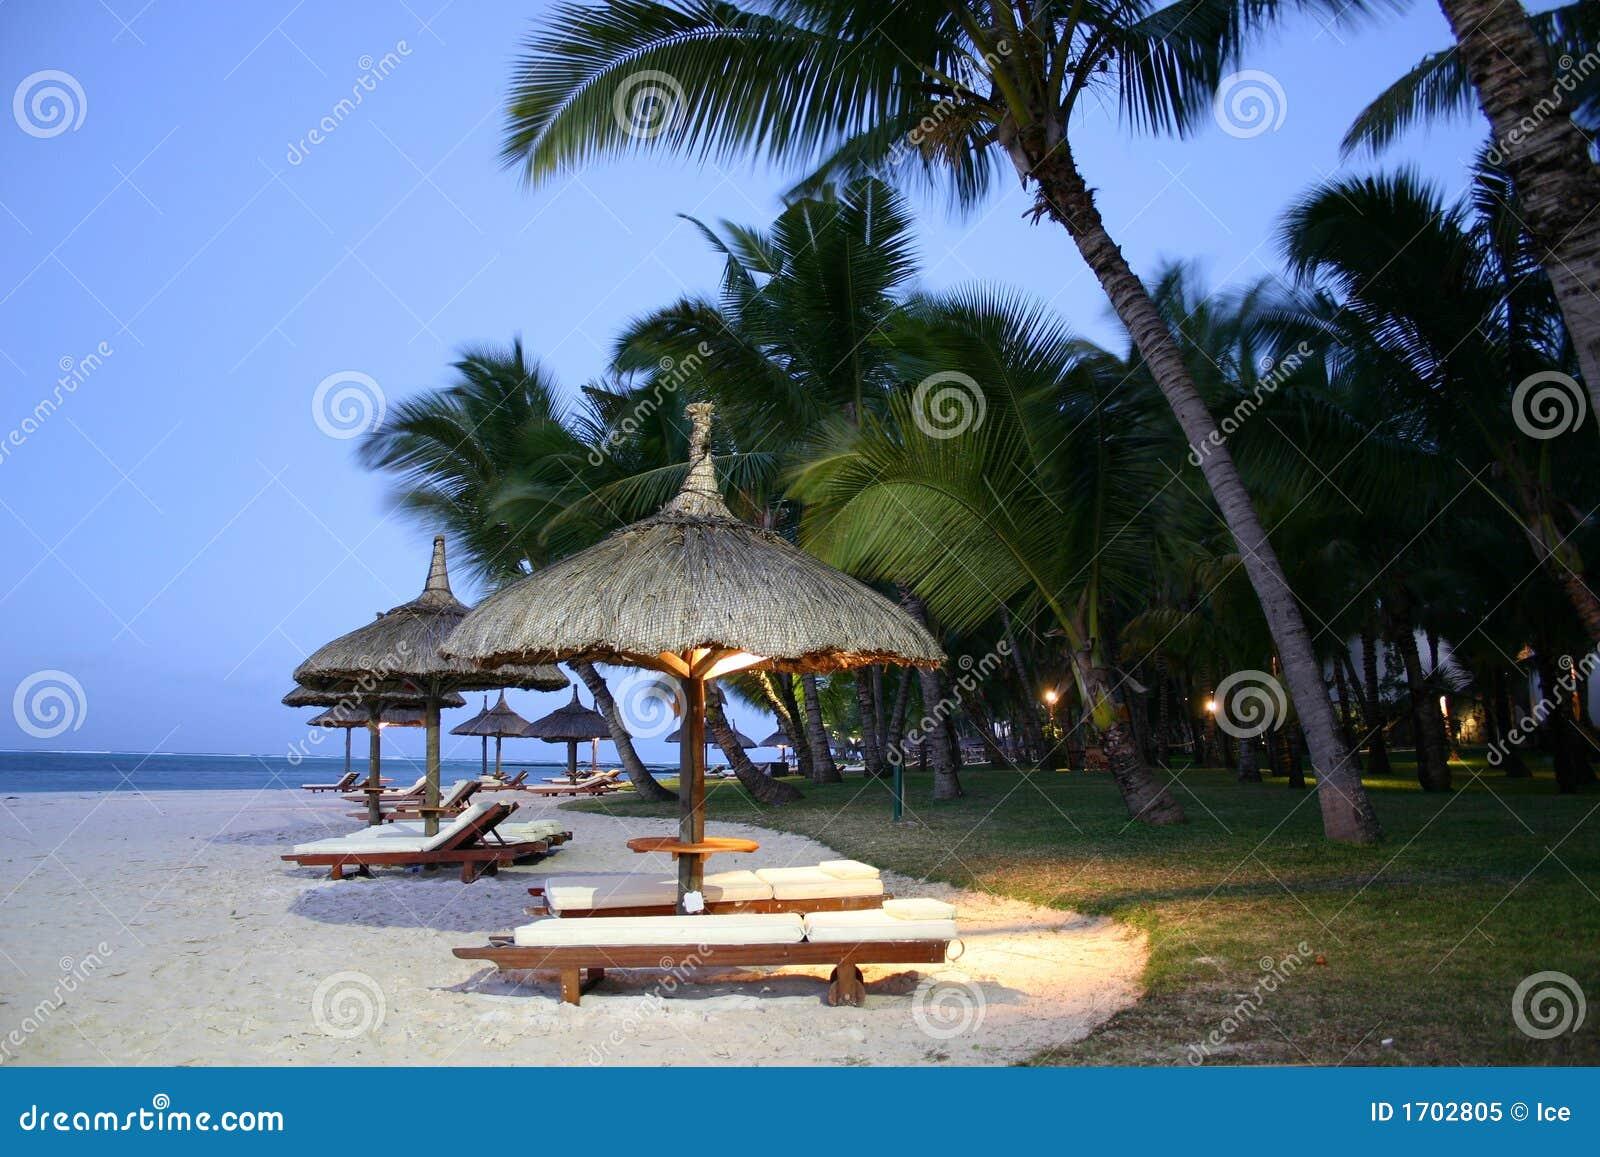 Download Island Umbrellas stock image. Image of palm, romantic - 1702805